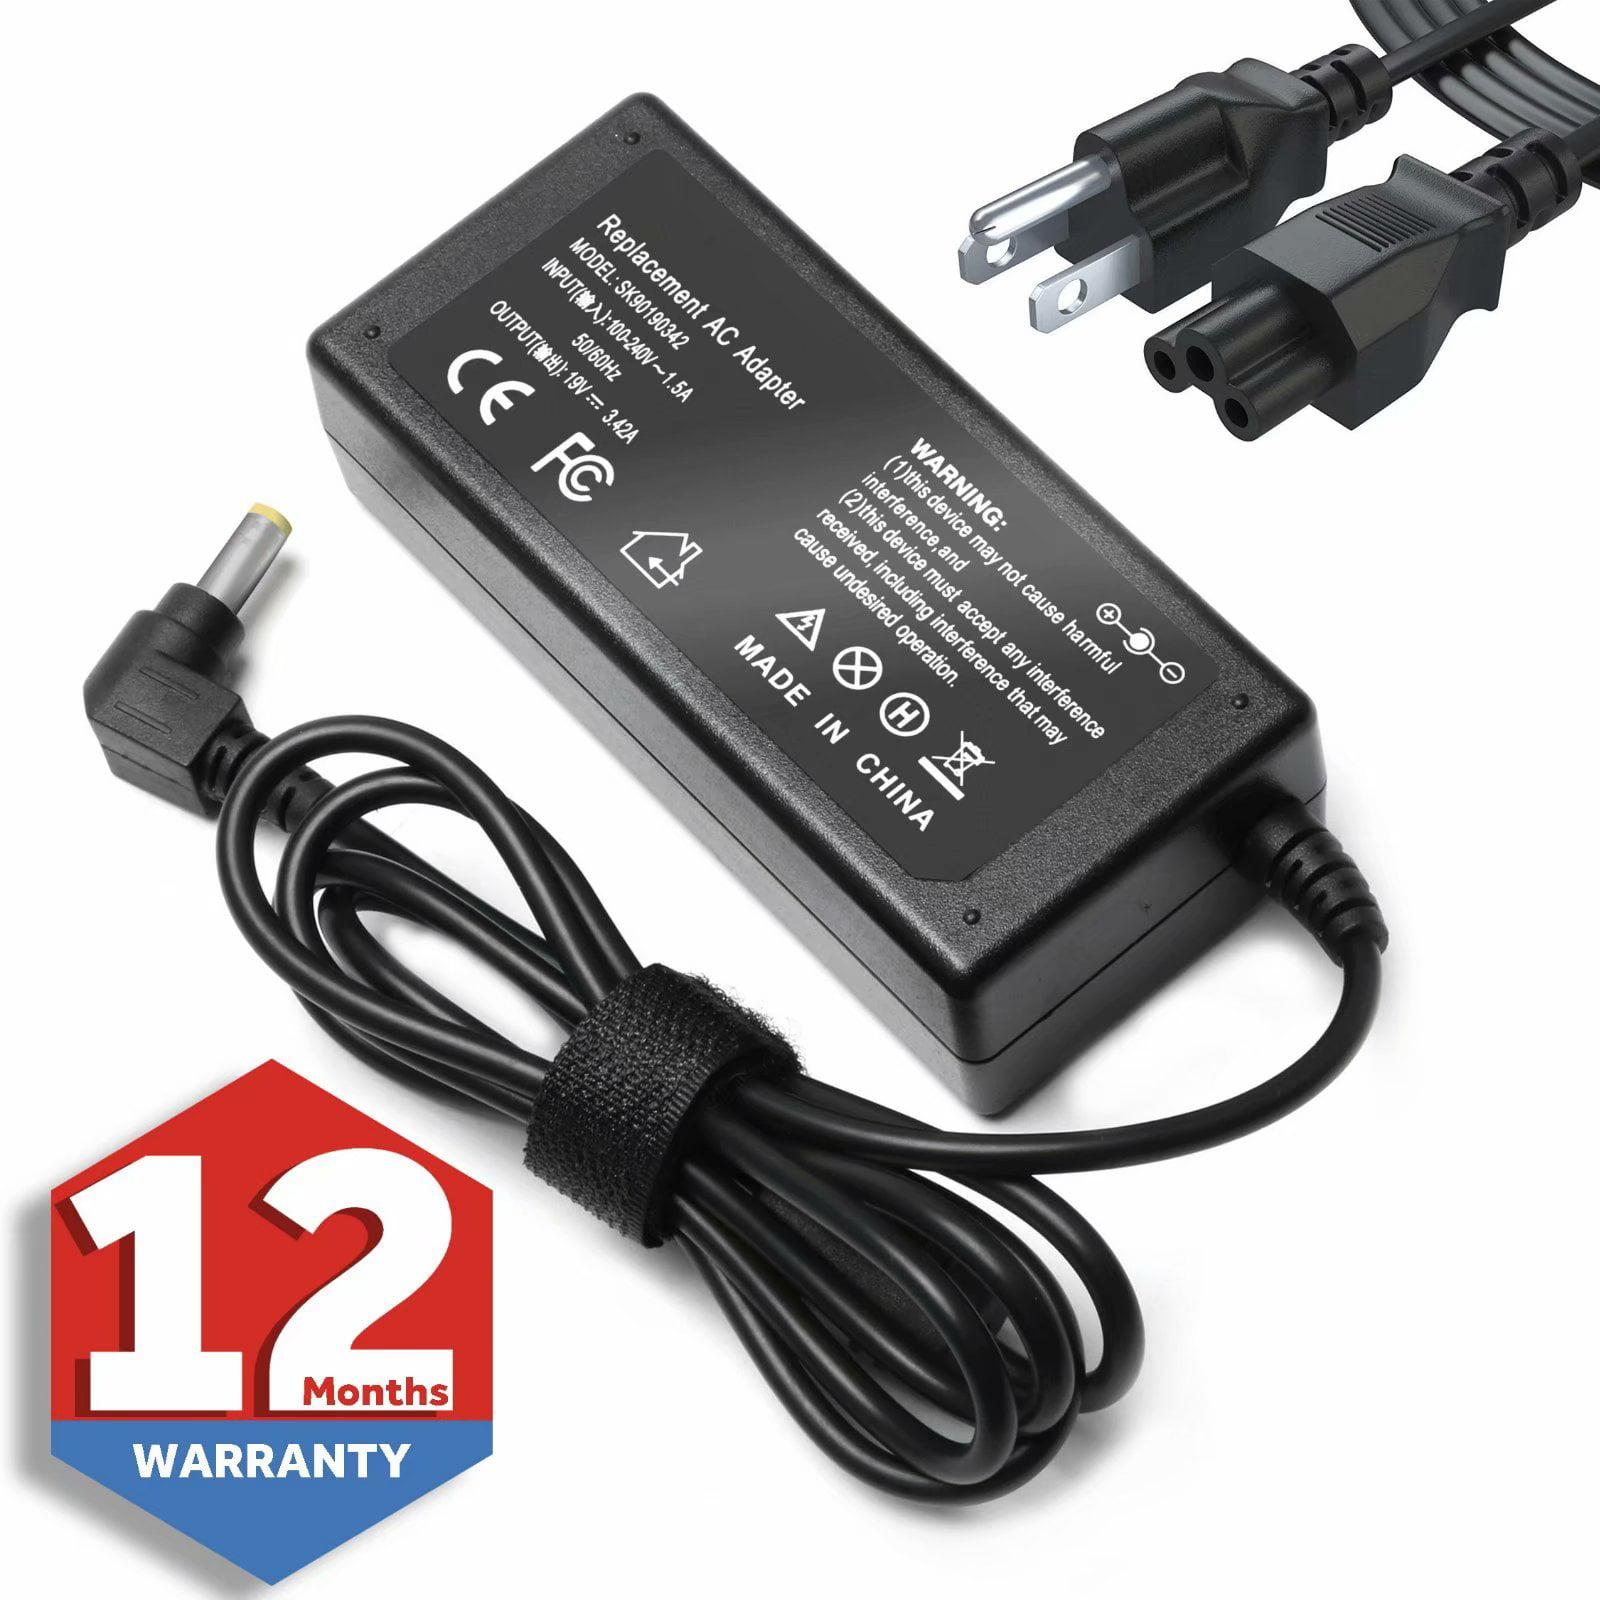 AC Adapter For Harman Kardon NSA40ED-190200 ESX2567Q Bluetooth Speaker Charger